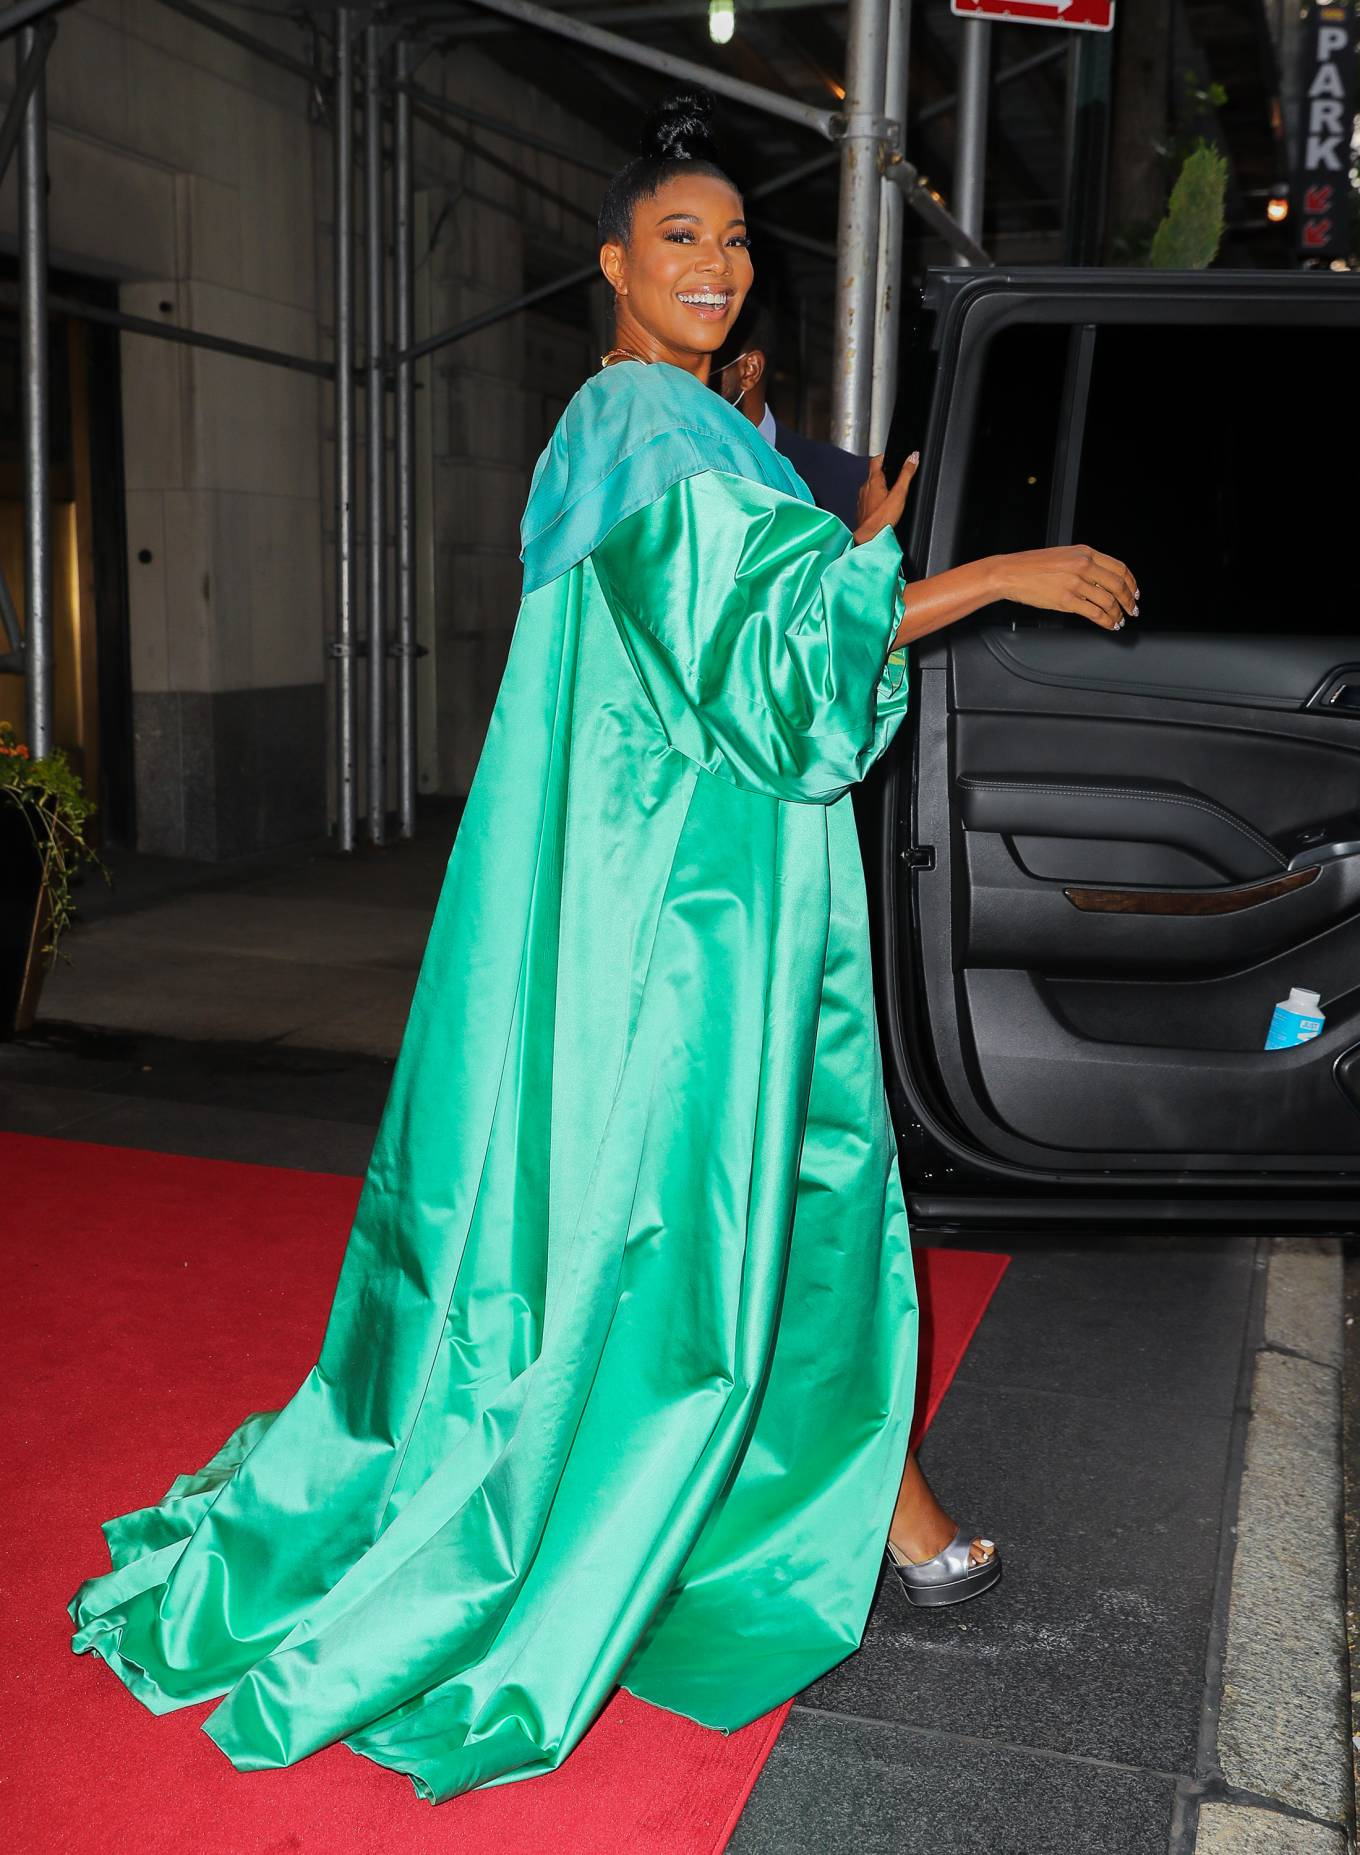 Gabrielle Union 2021 : Gabrielle Union – Seen in a green dress in New York-07